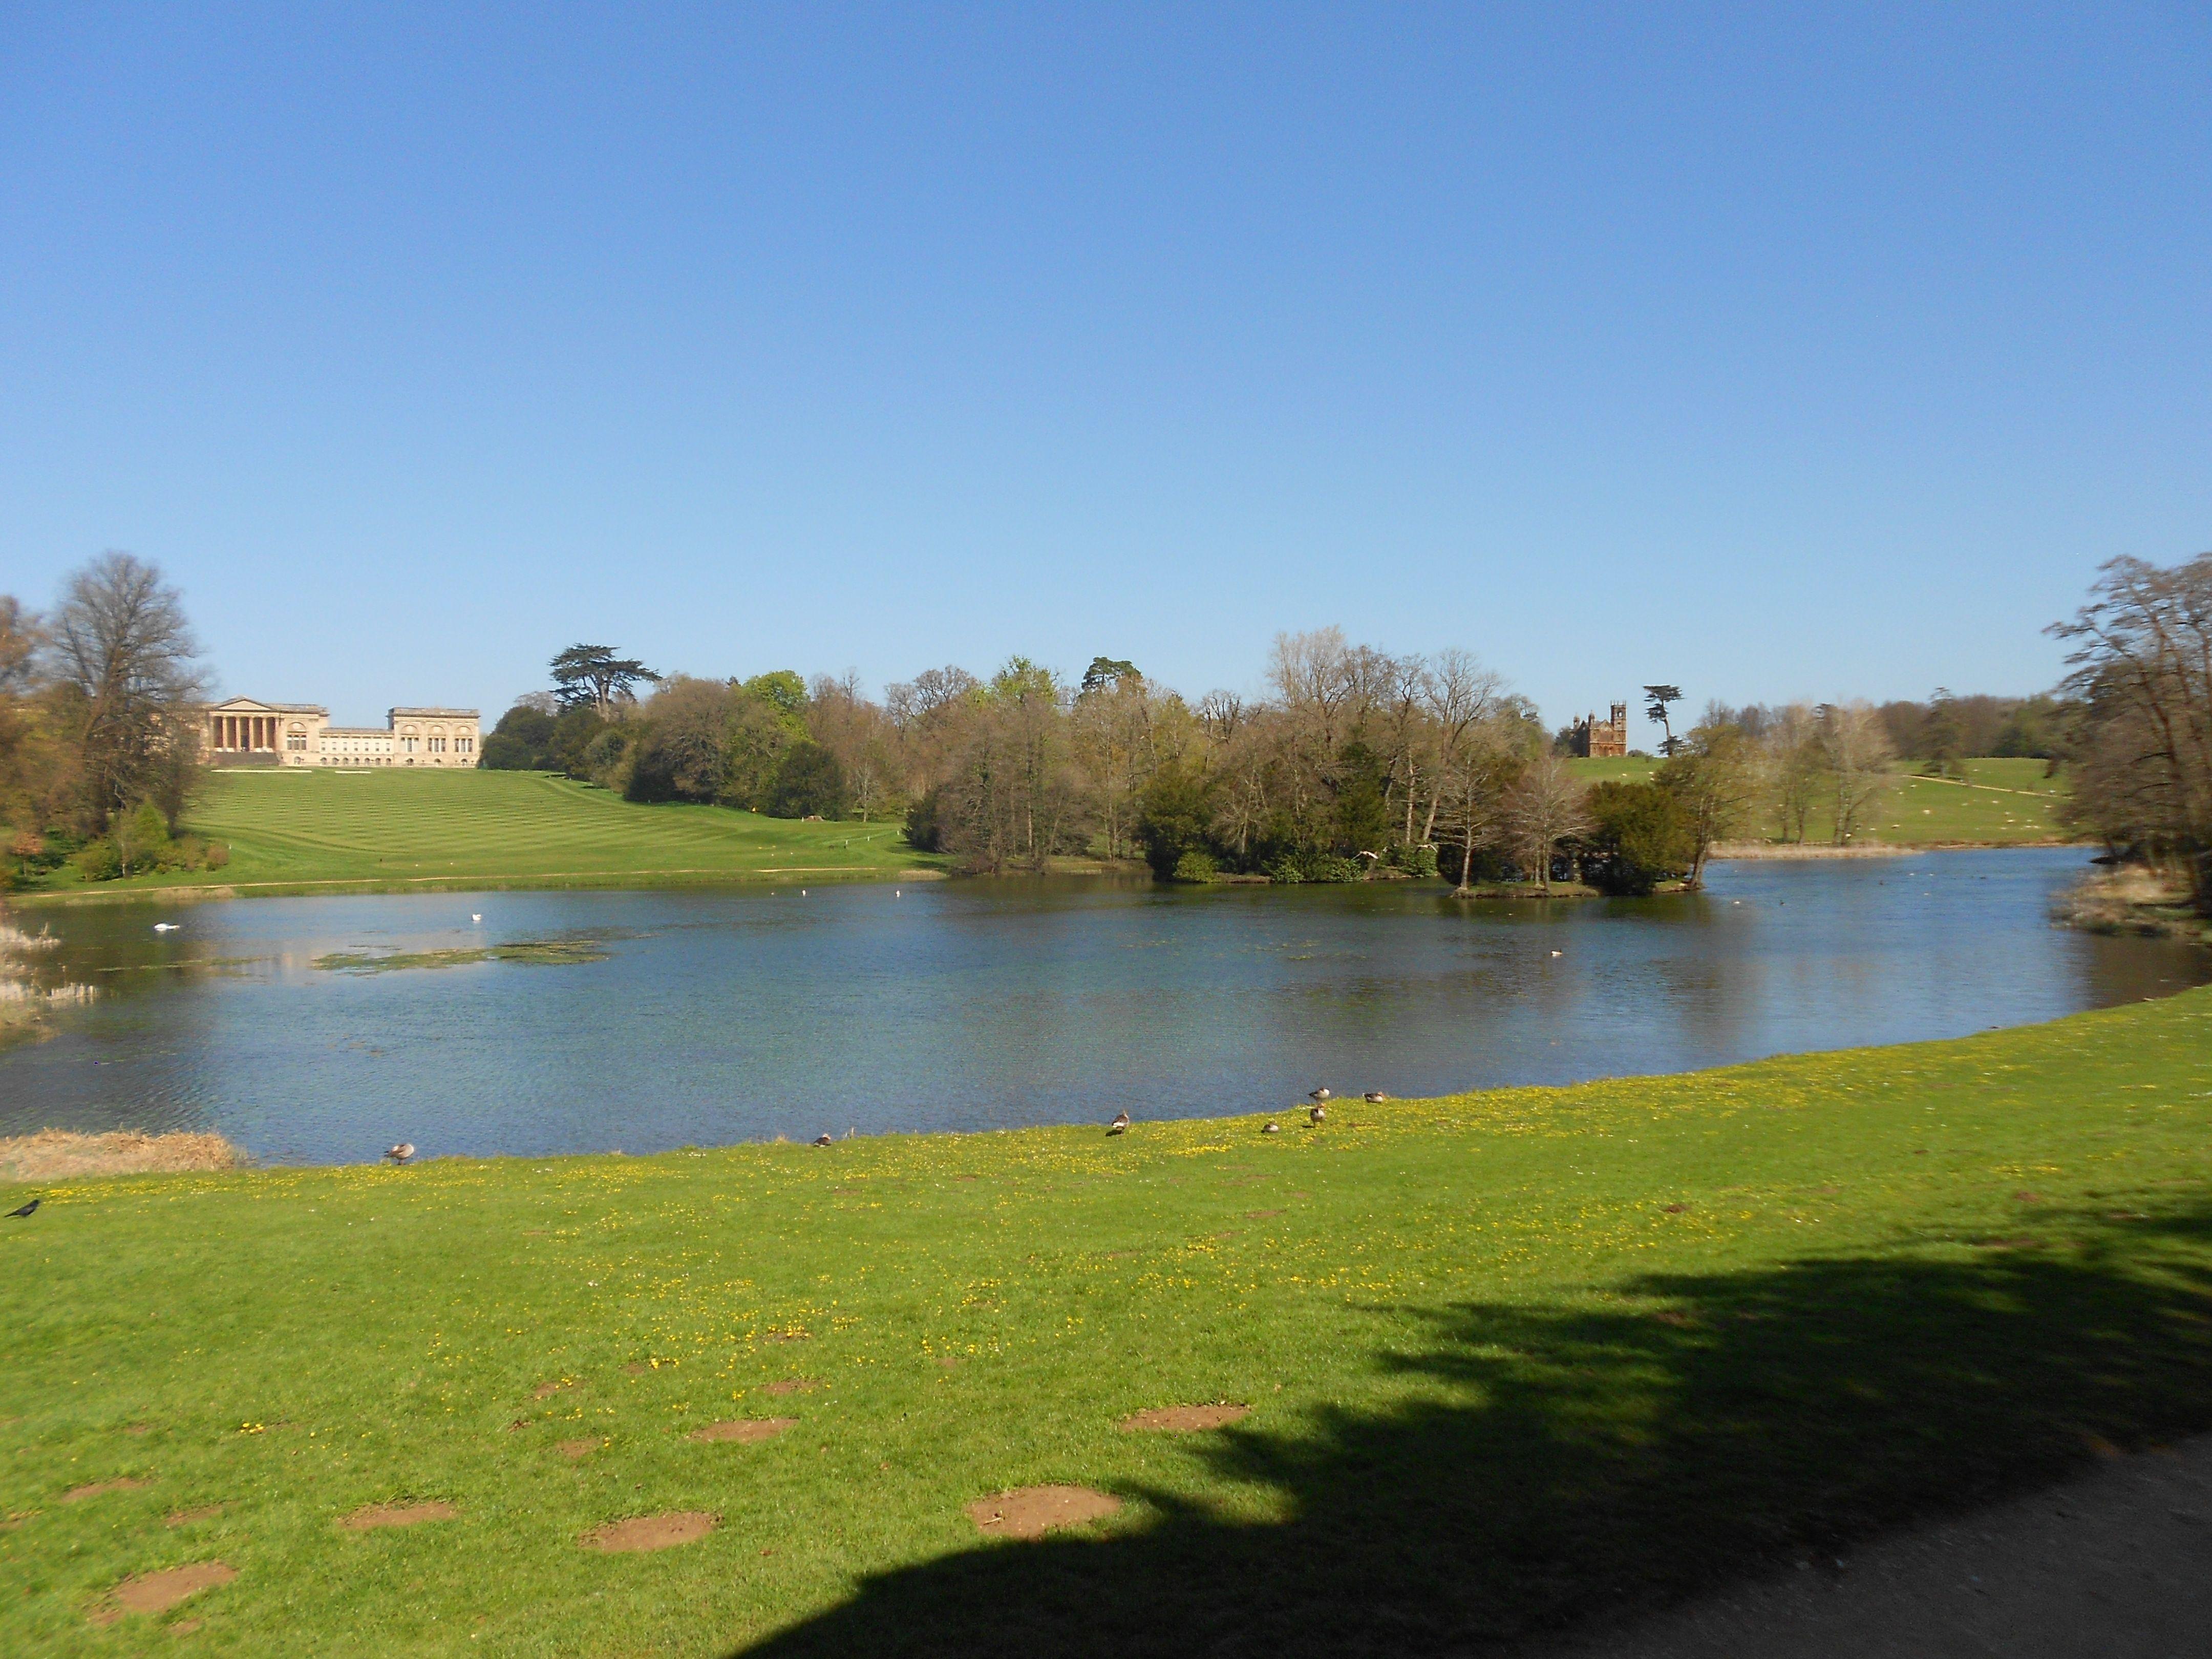 Stowe Garden